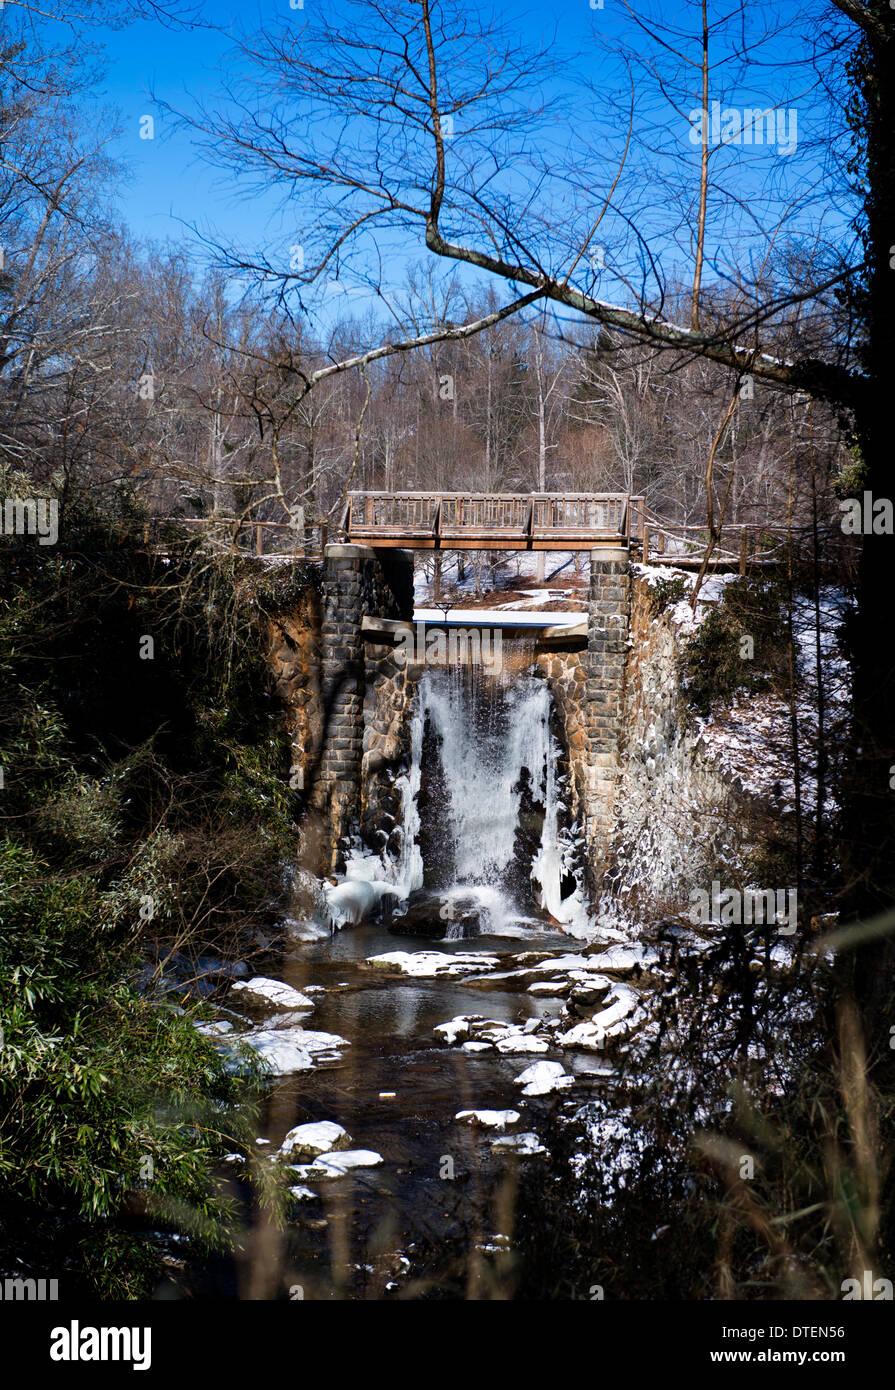 Winter Scene at the Biltmore Mansion Grounds, Asheville, North Carolina - Stock Image